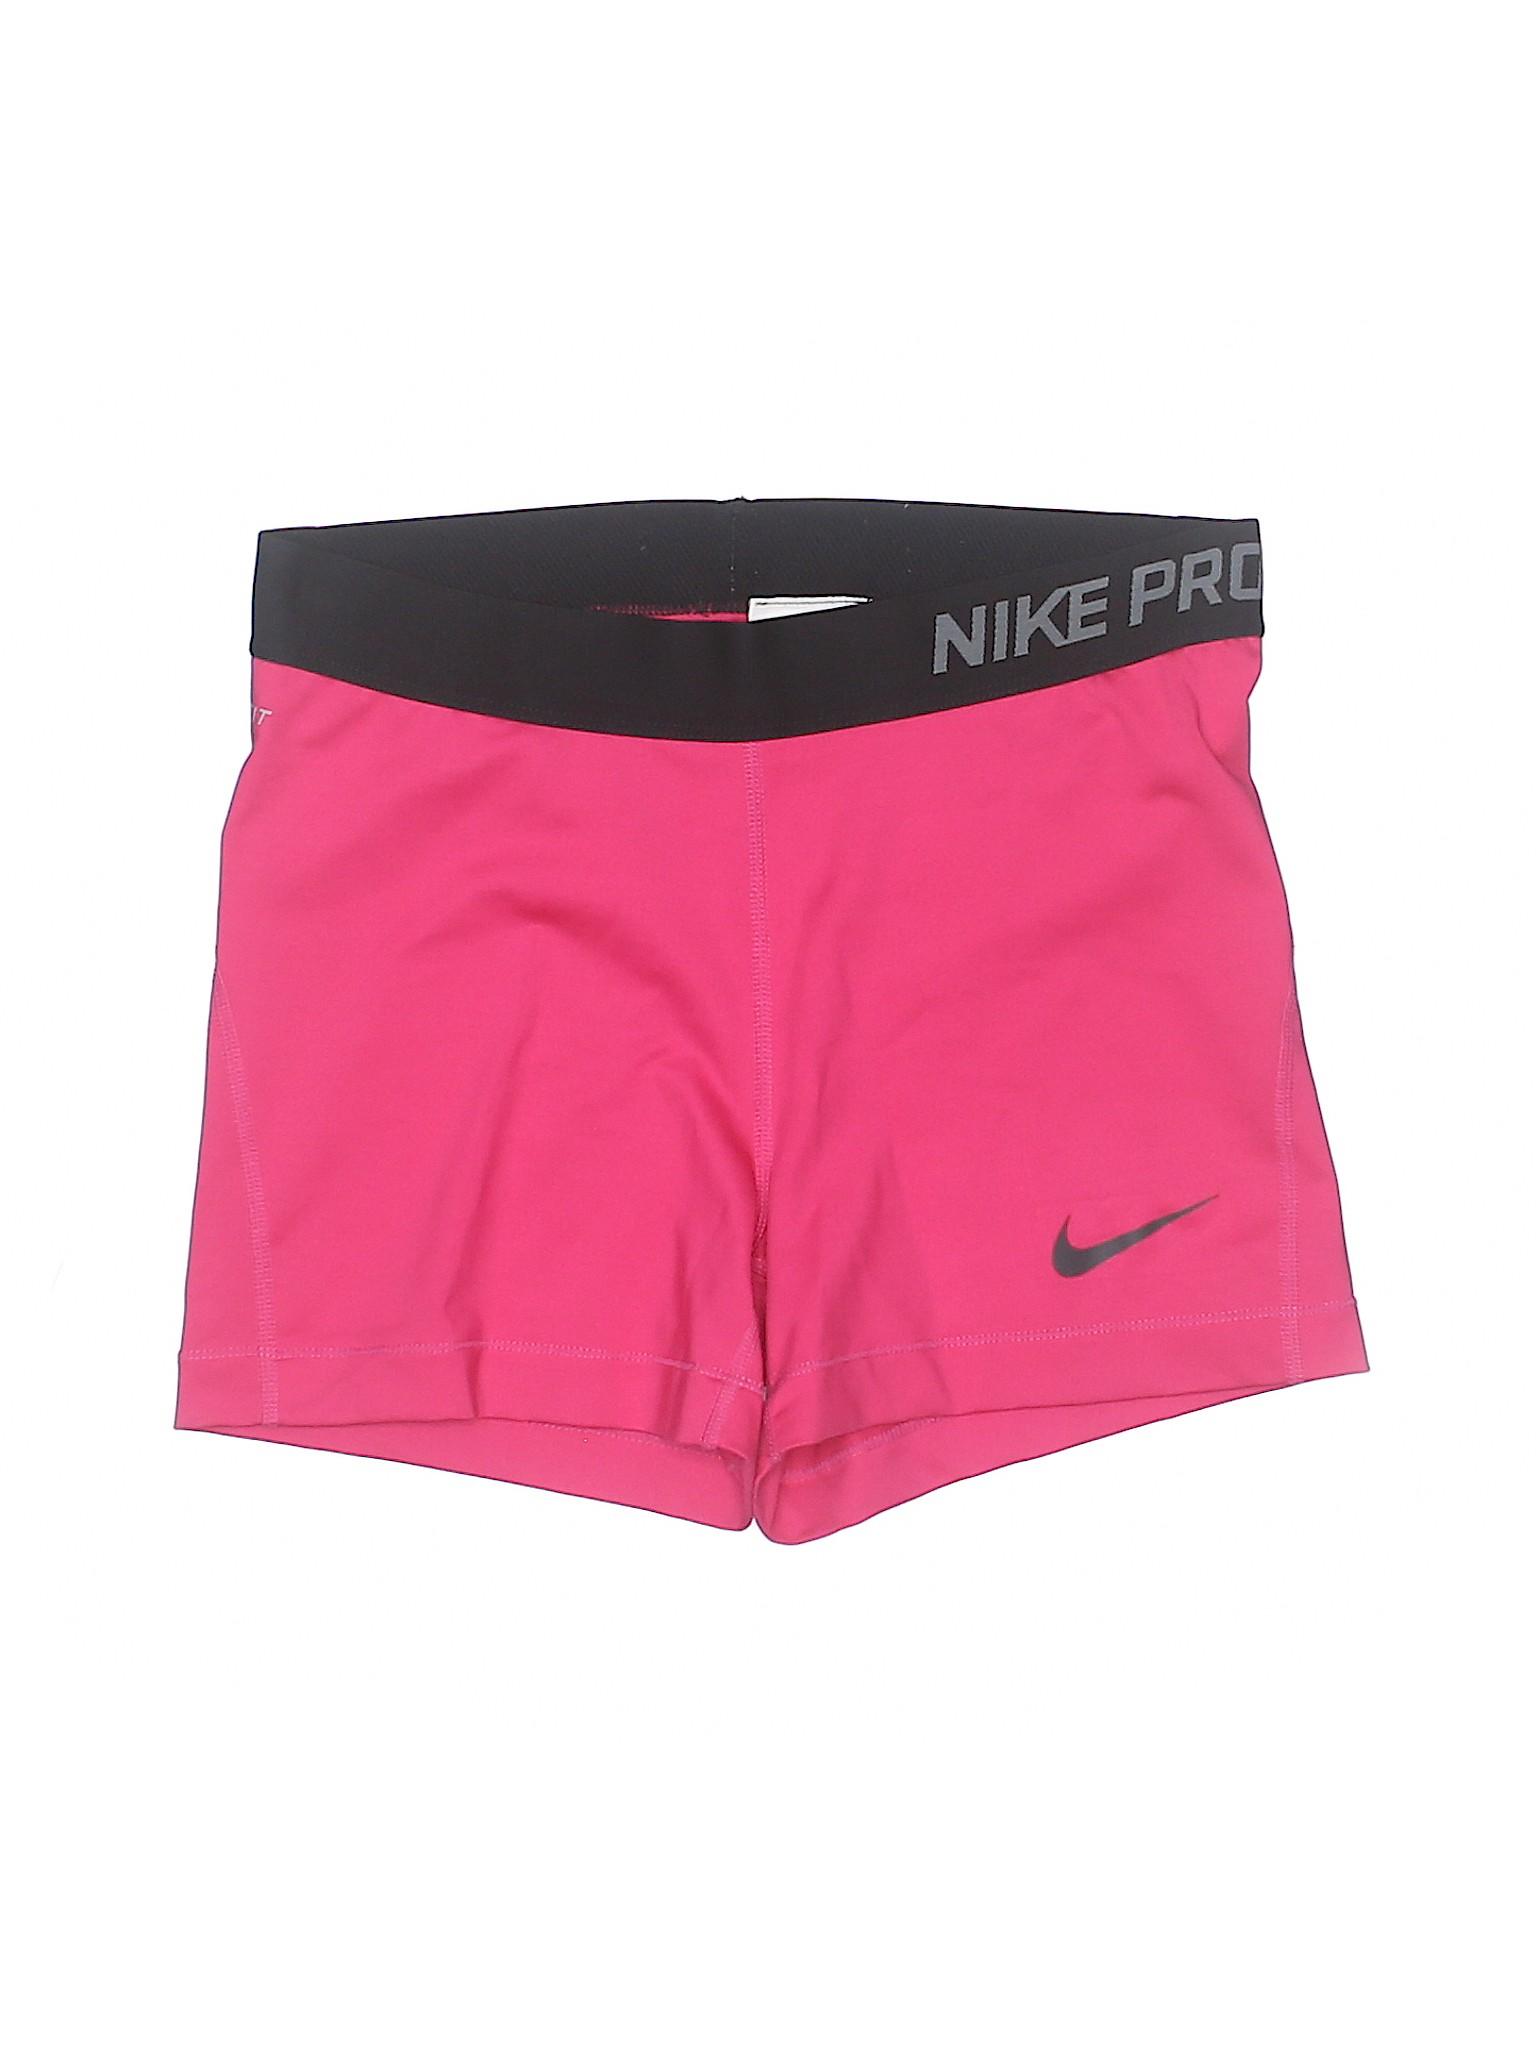 Shorts Nike Nike Athletic Boutique Boutique Nike Athletic Boutique Shorts Athletic qawZtt